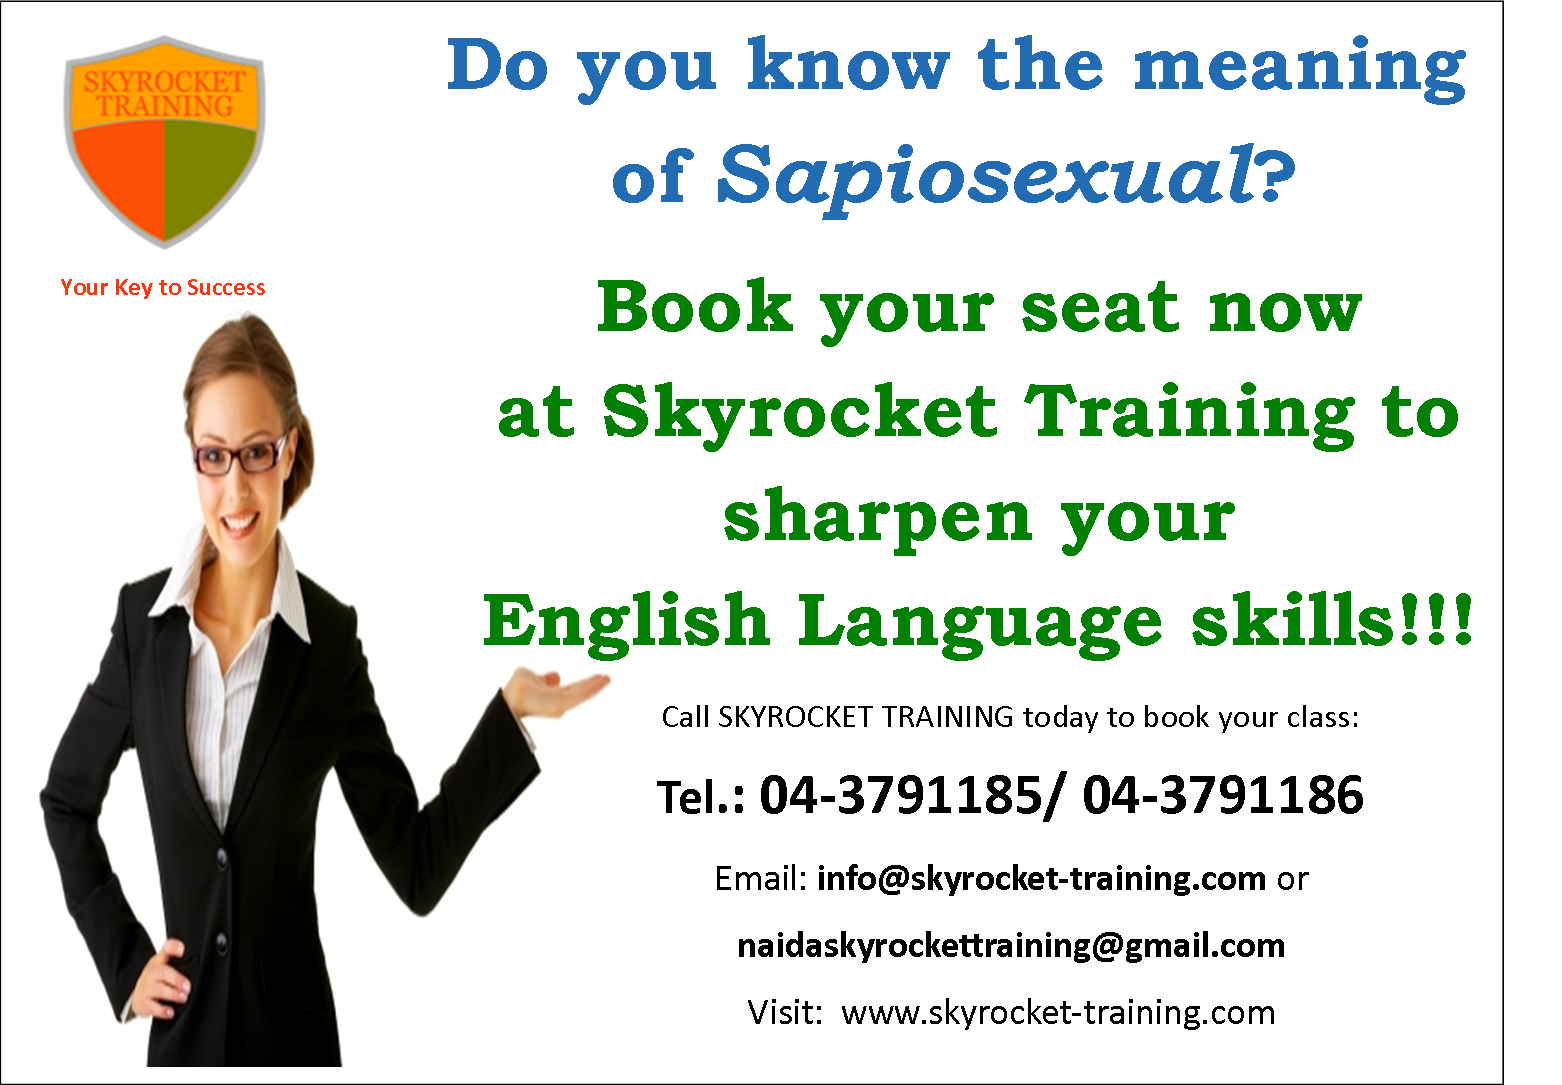 Book Your Seat Now At Skyrocket Training To Sharpen You English Language Skills Language Skills Success Books Improve Your English